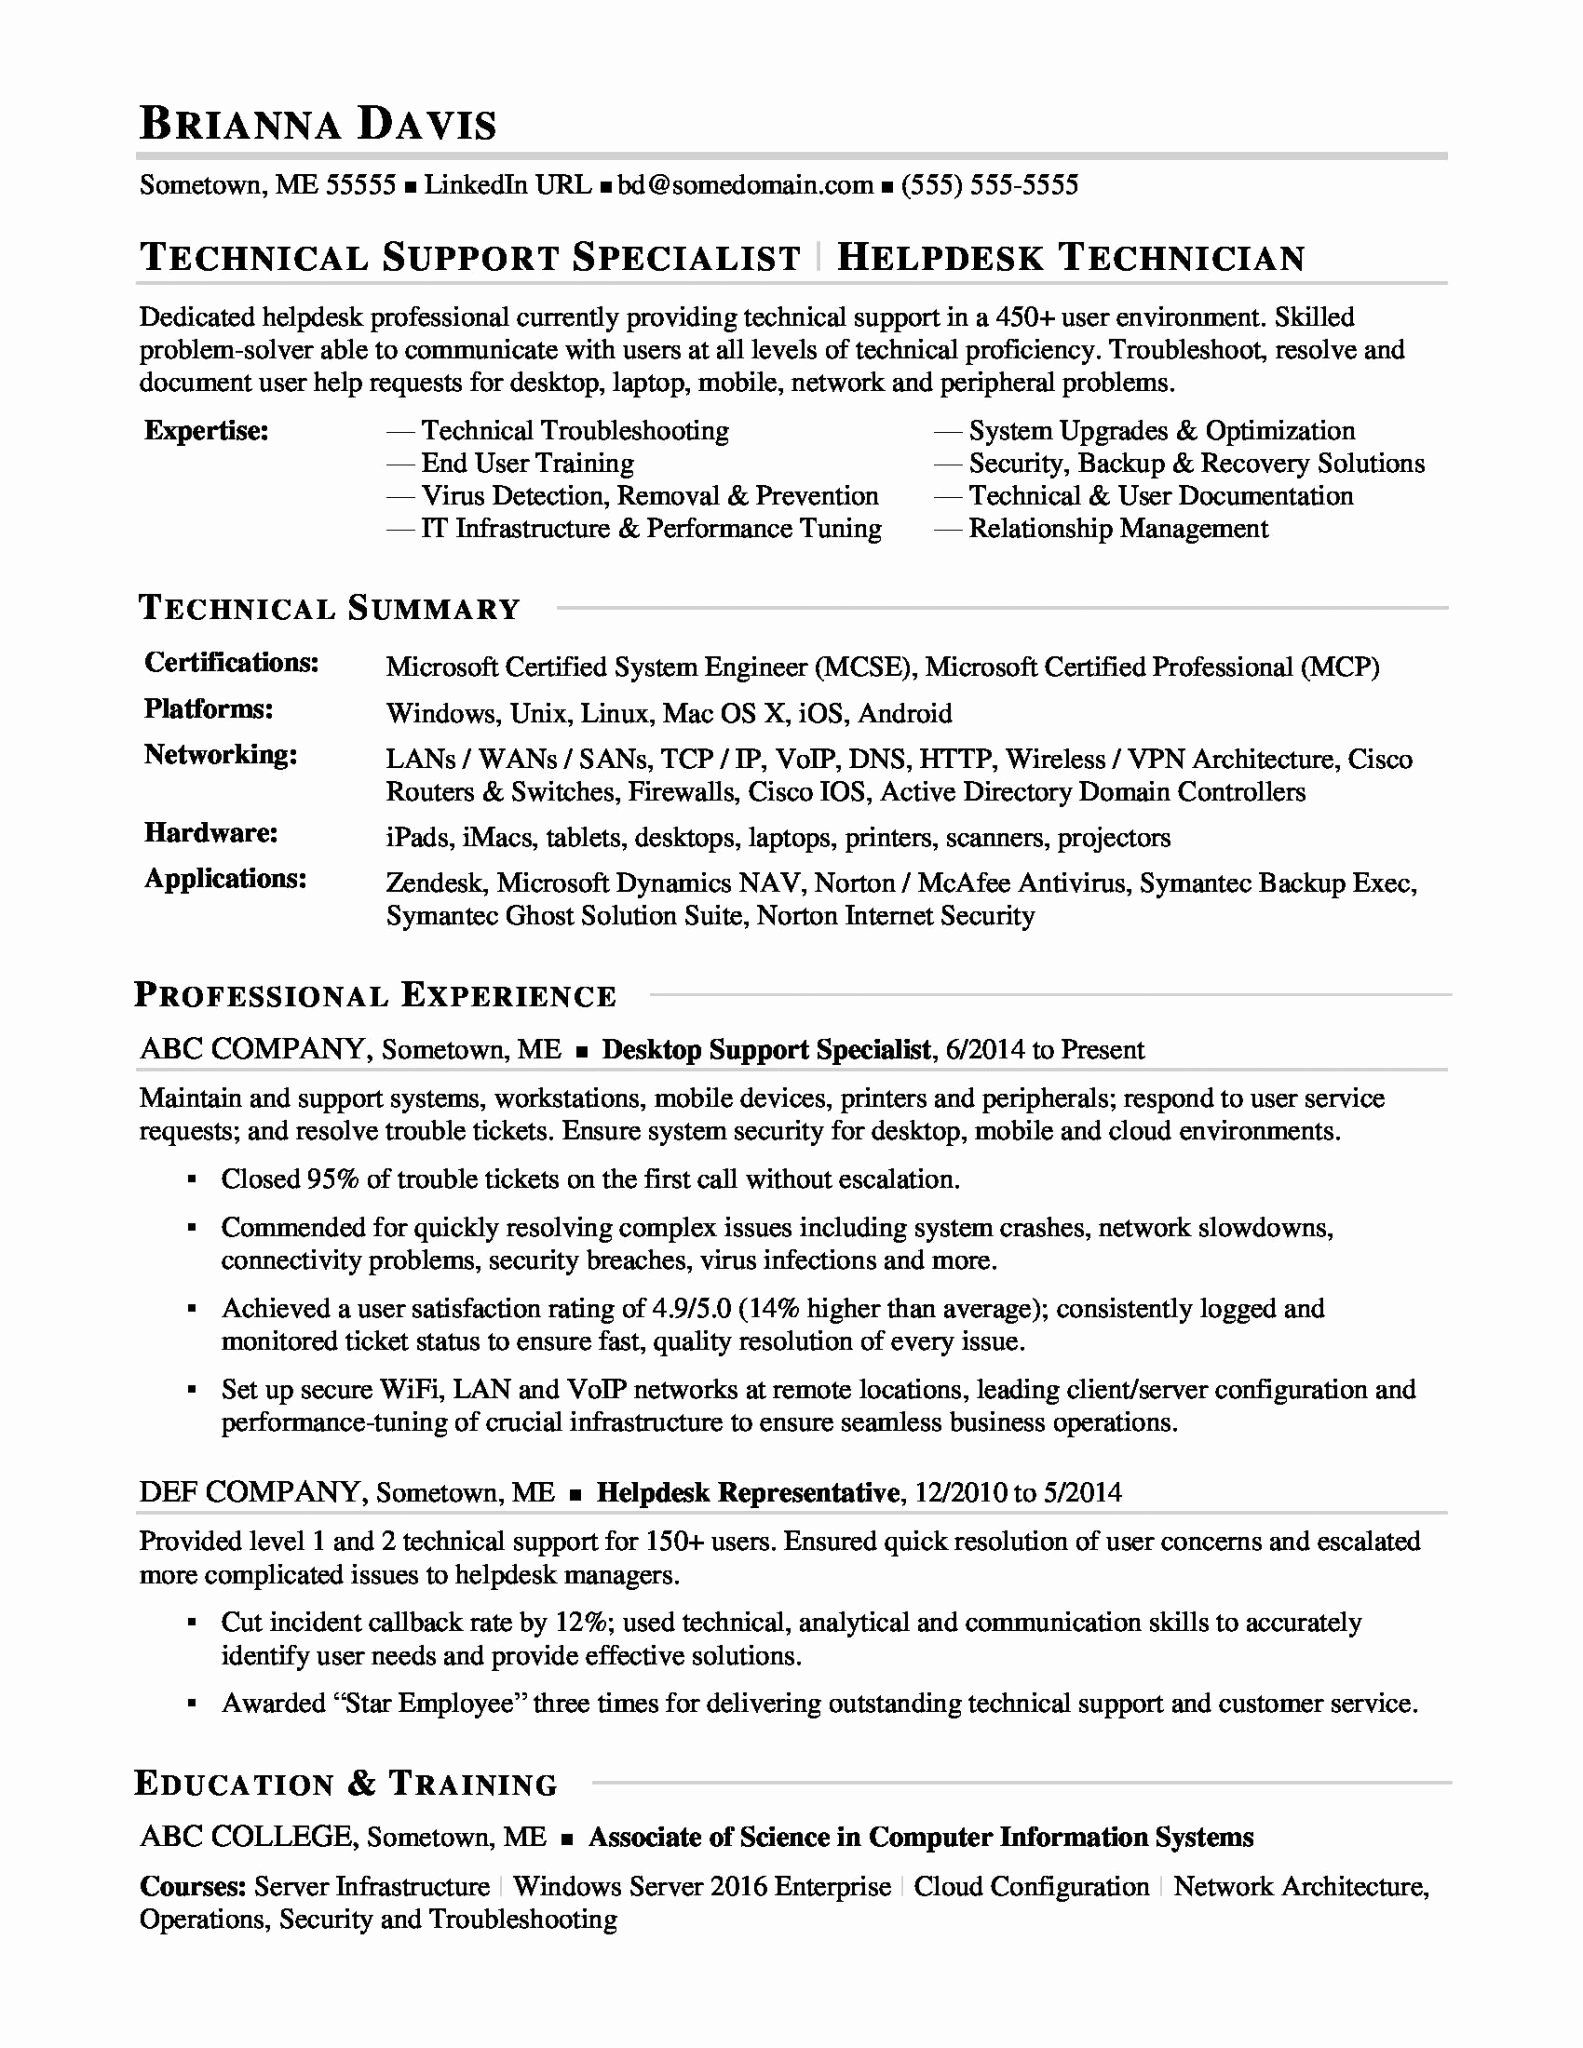 Pin Di Best Modern Resume Description Example